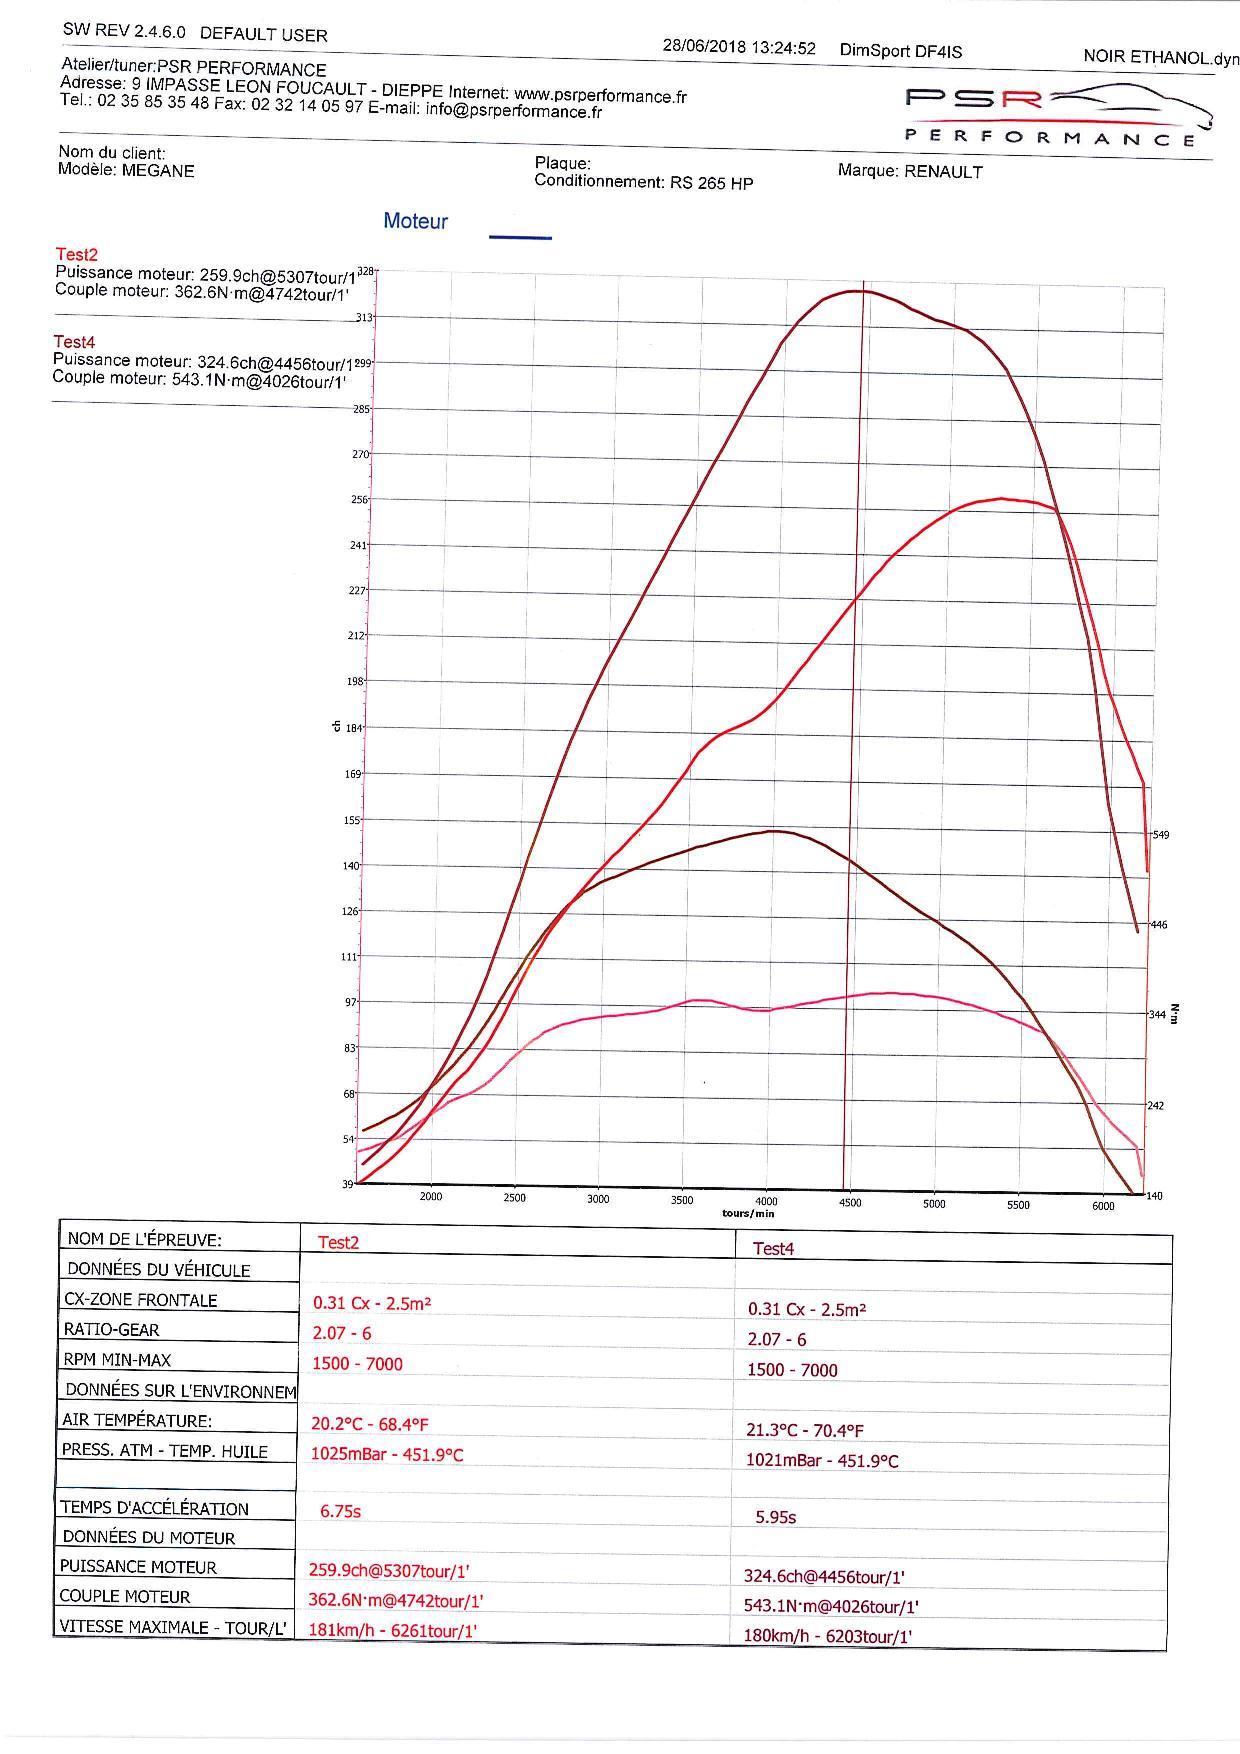 MEGANE RS 265 HP BIO ETHANOL